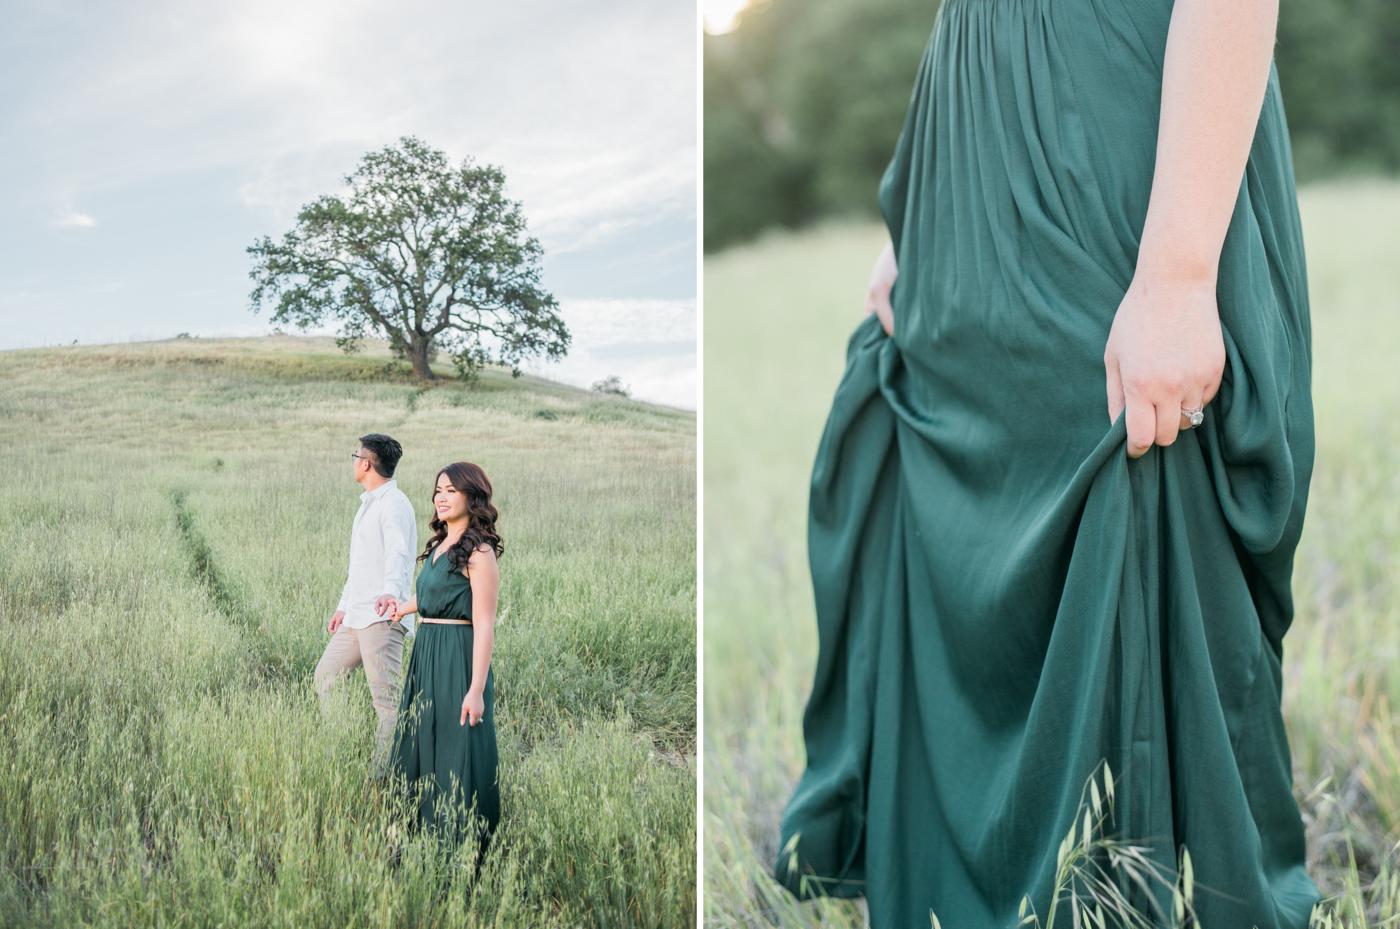 dianne&christian-malibu-creek-state-park-engagement-session-photography-los-angeles-based-wedding-photographer-11.jpg